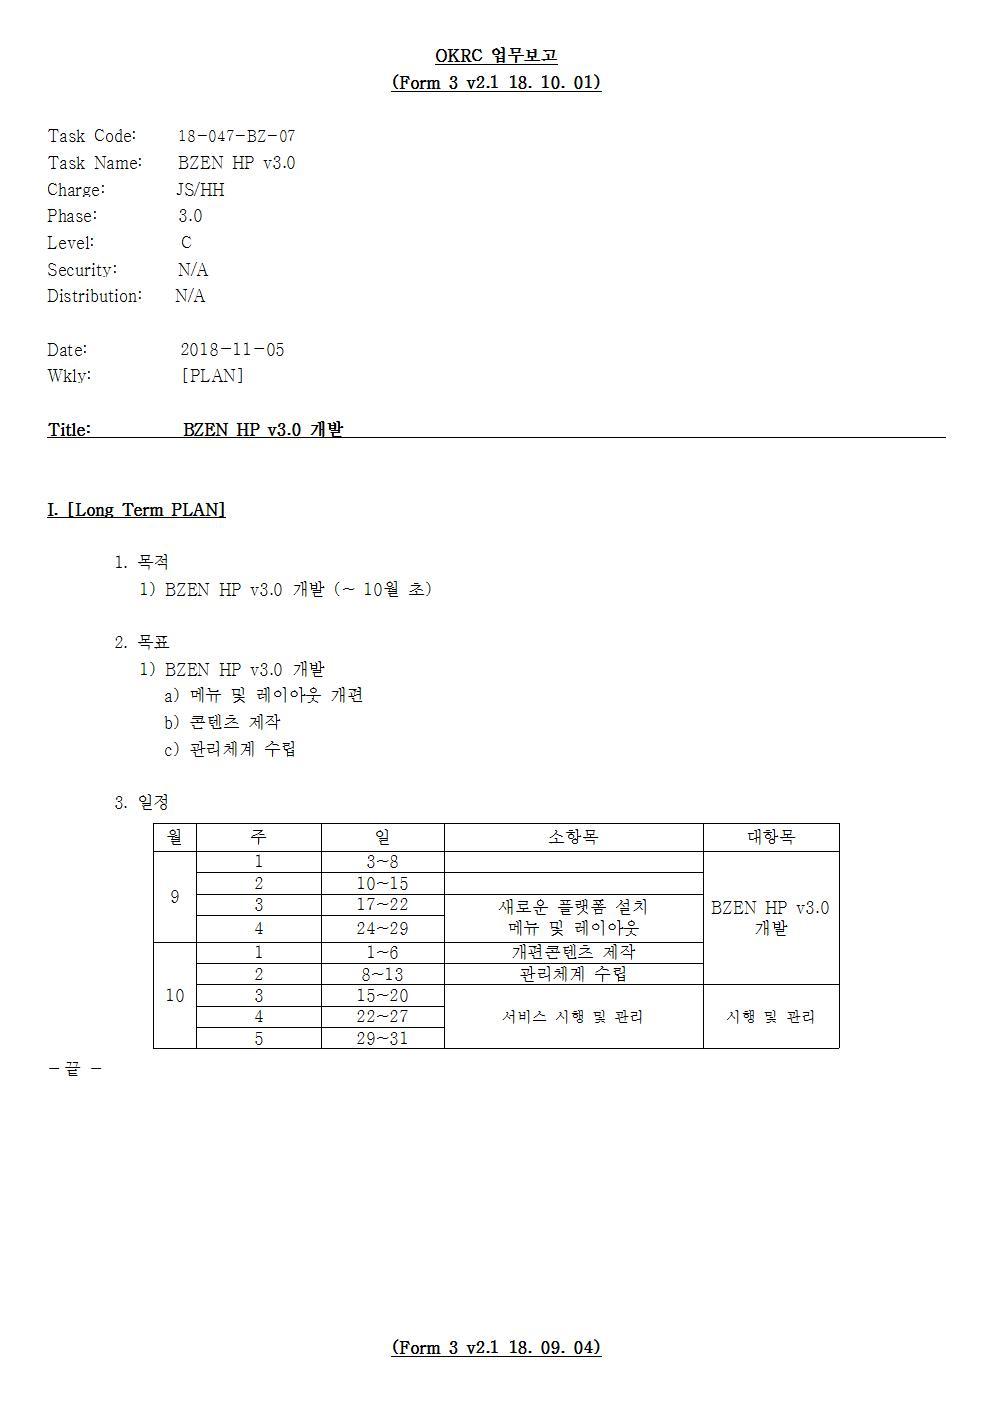 D-[18-047-BZ-07]-[BZEN HP v3.0]-[2018-11-05][HH]001.jpg